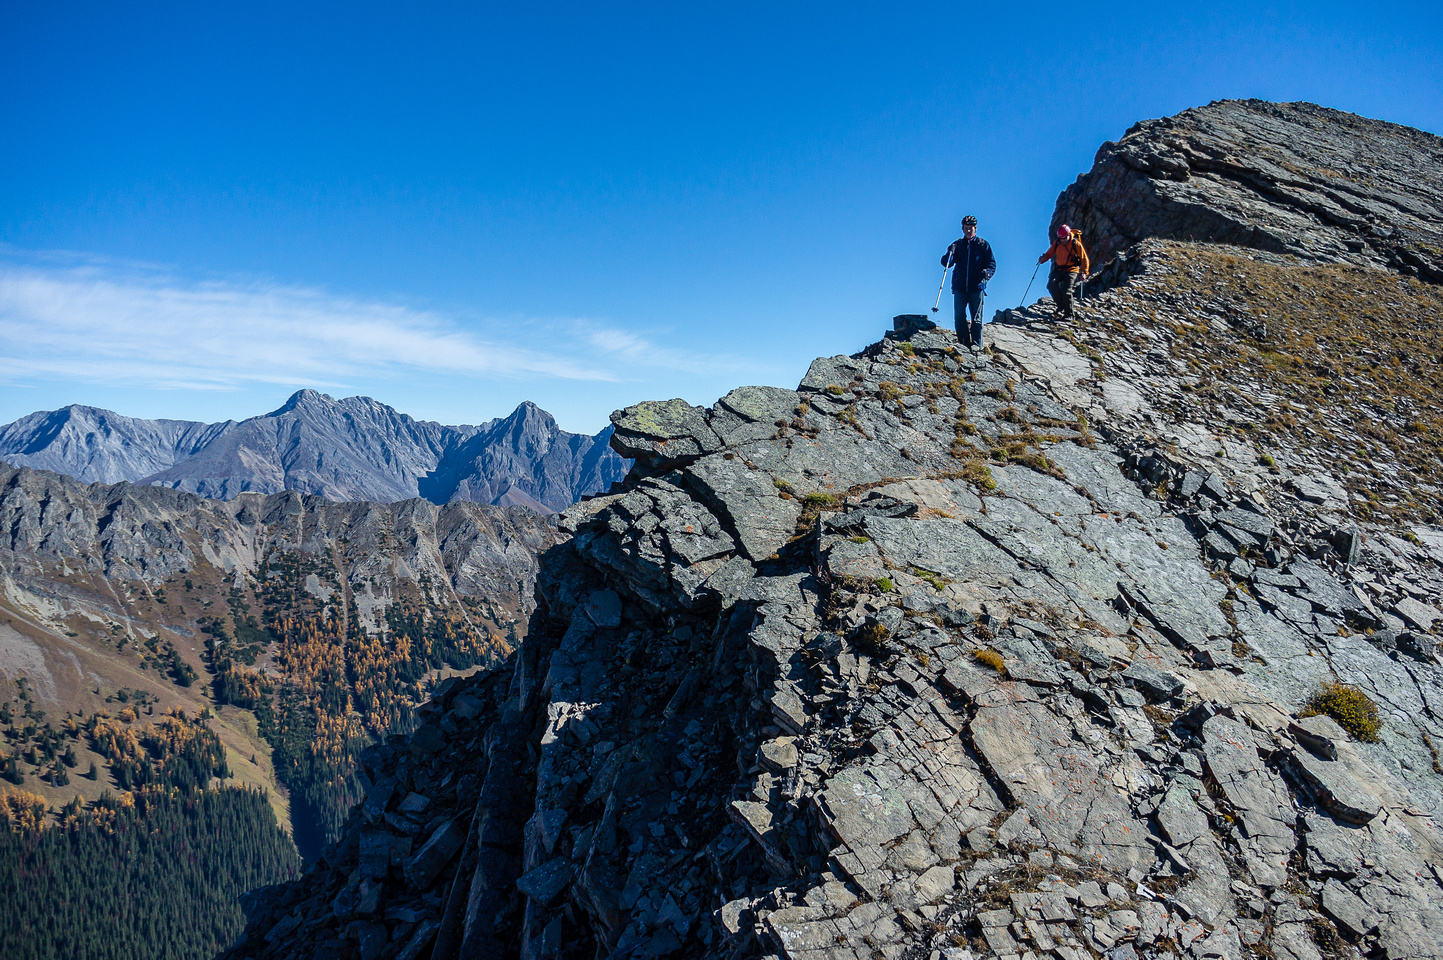 Descending the ridge.